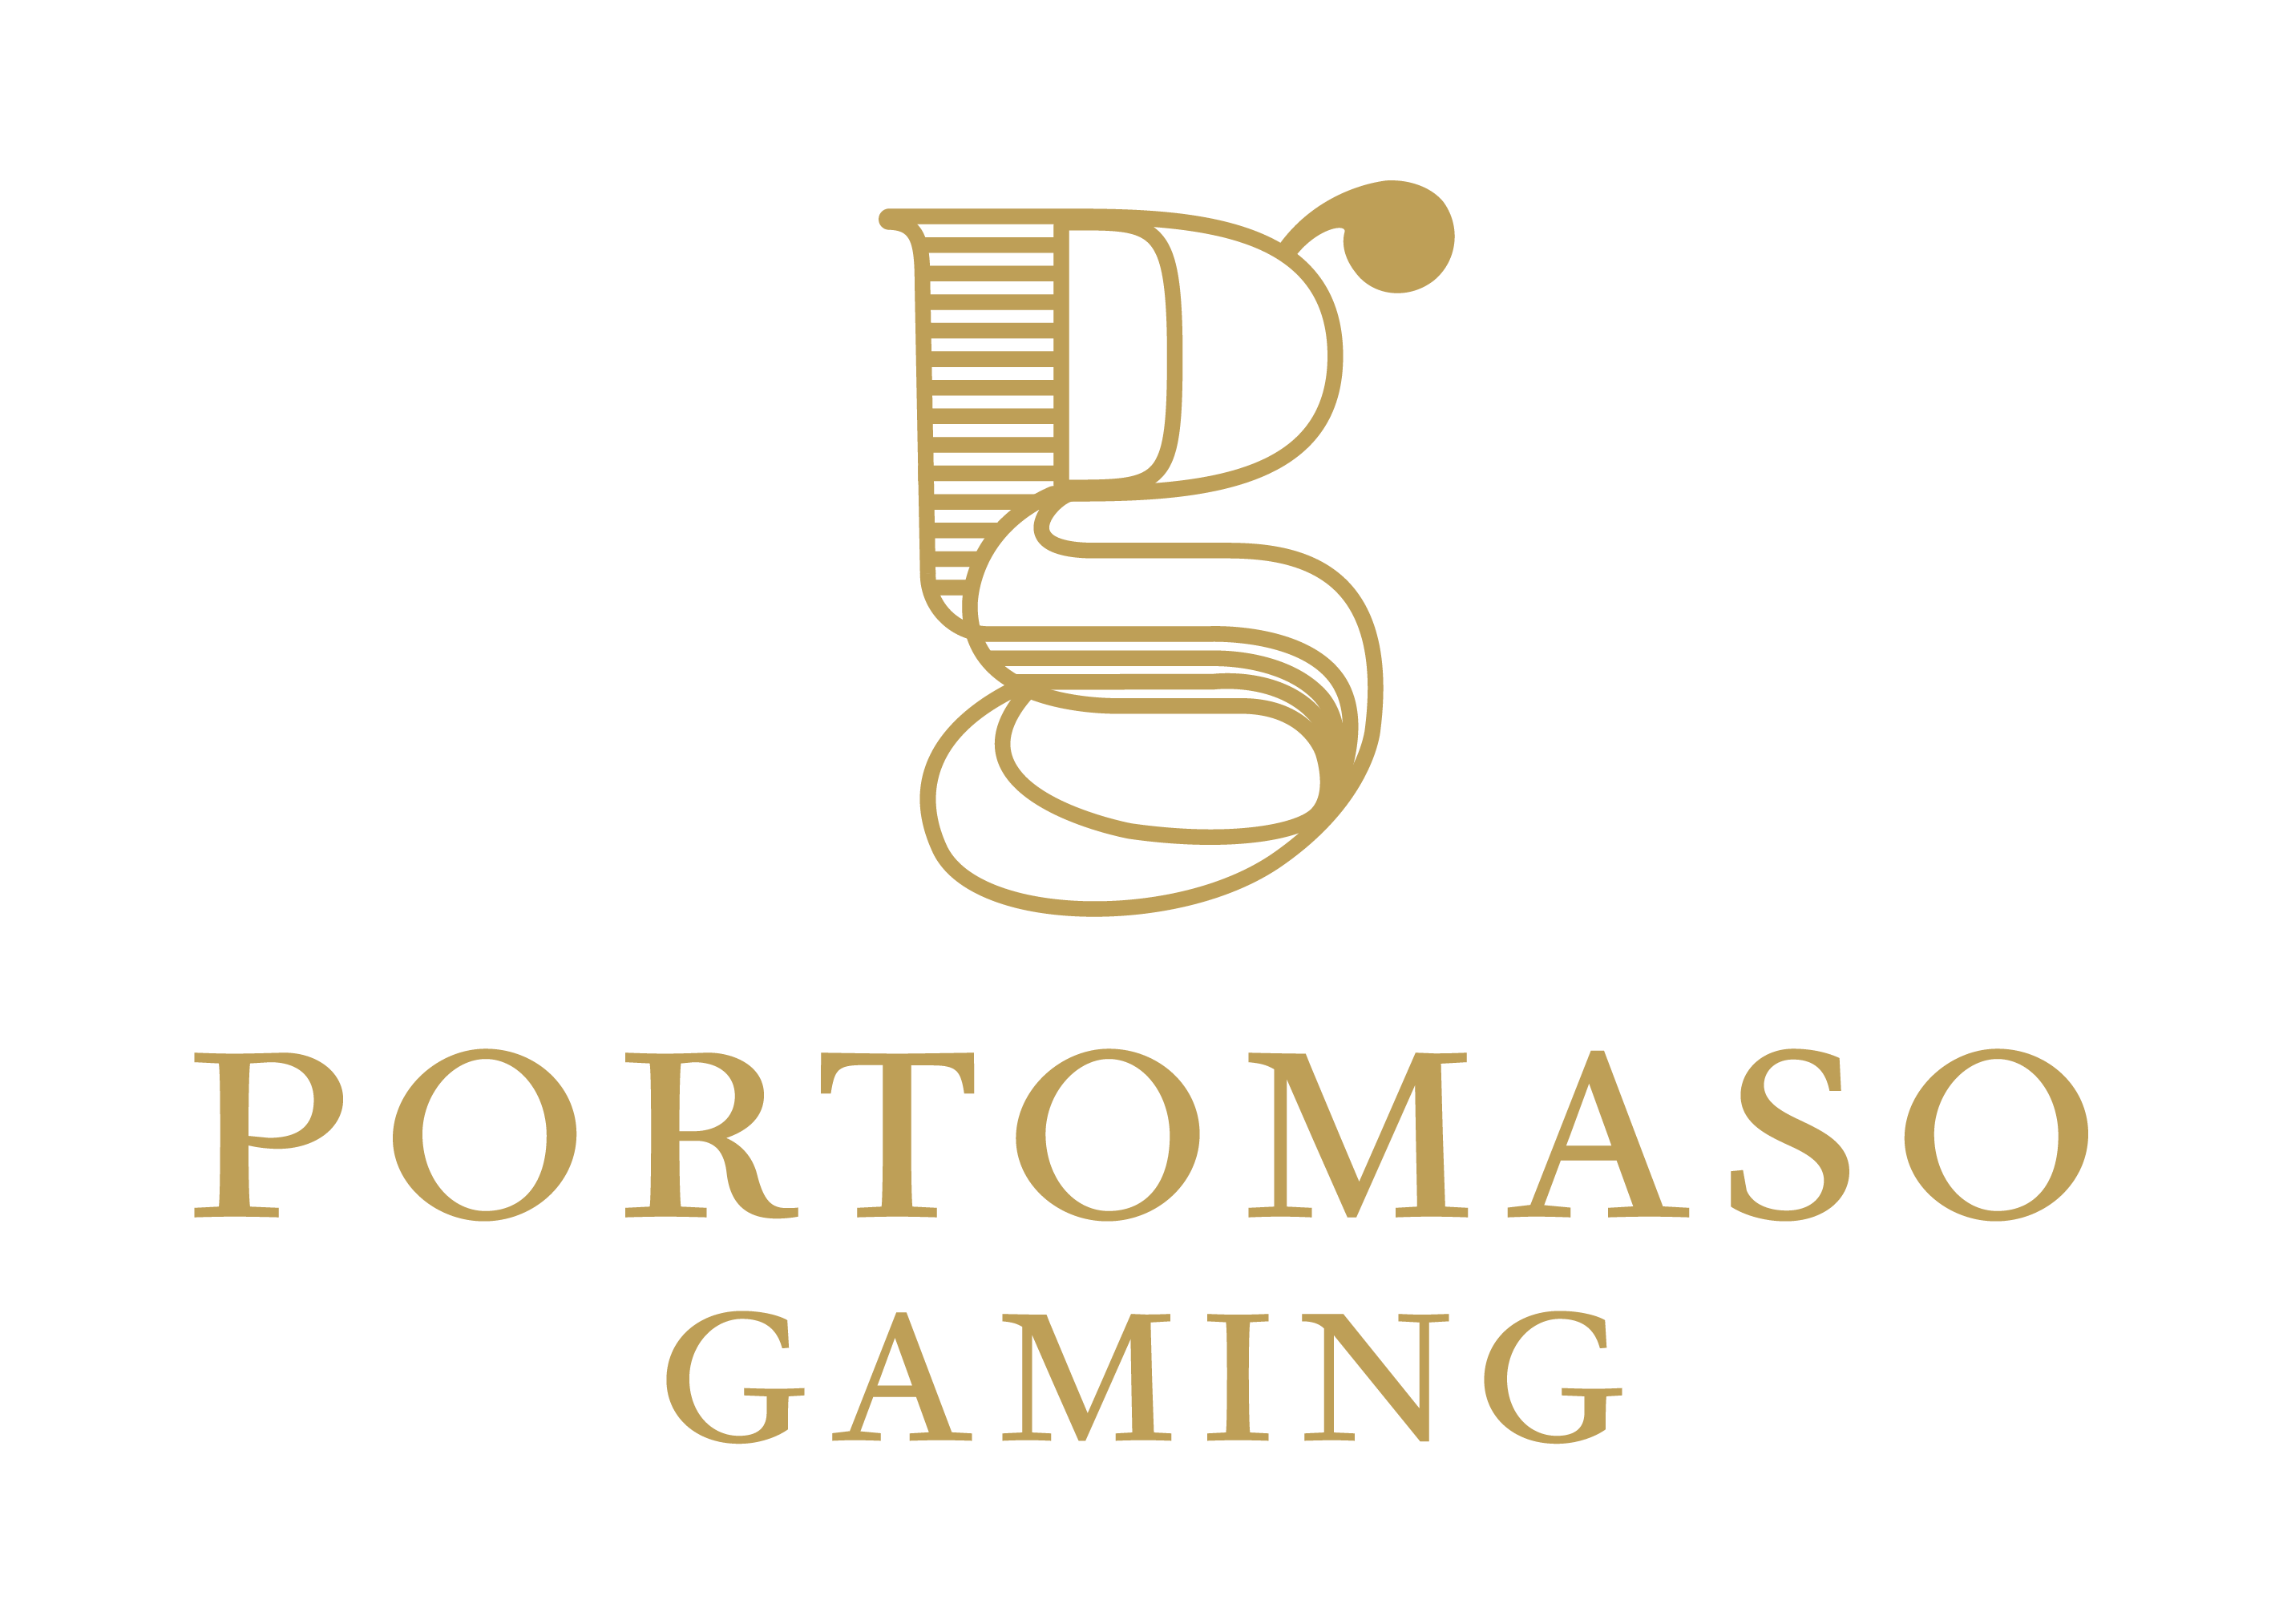 Portomaso Gaming Spiele